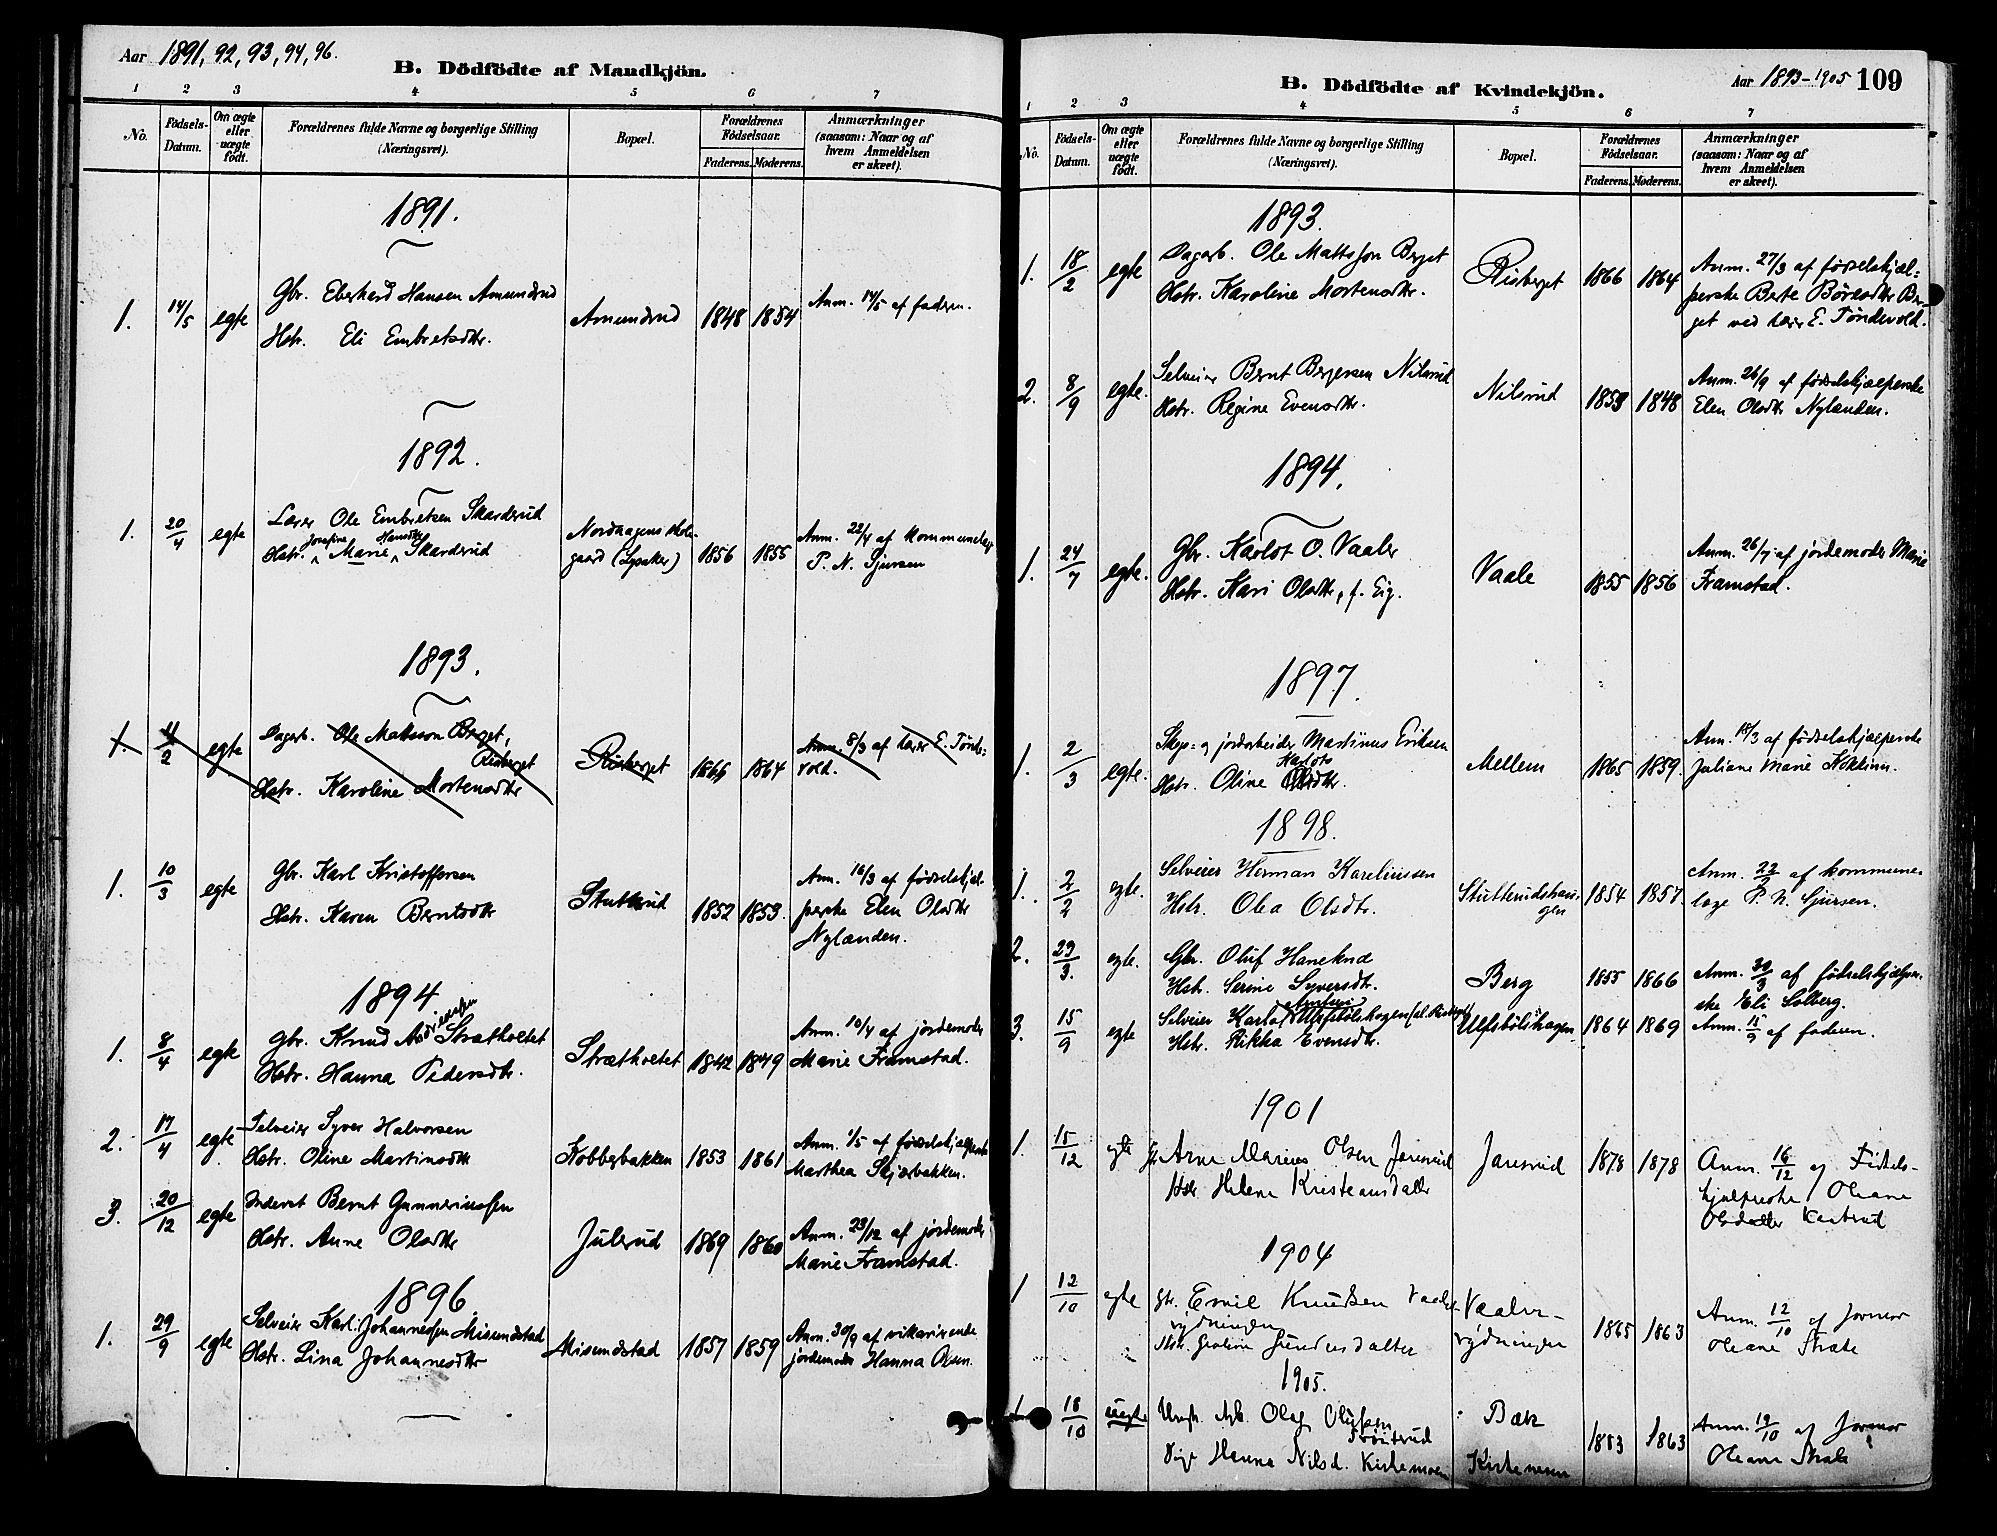 SAH, Våler prestekontor, Ministerialbok nr. 3, 1879-1911, s. 109